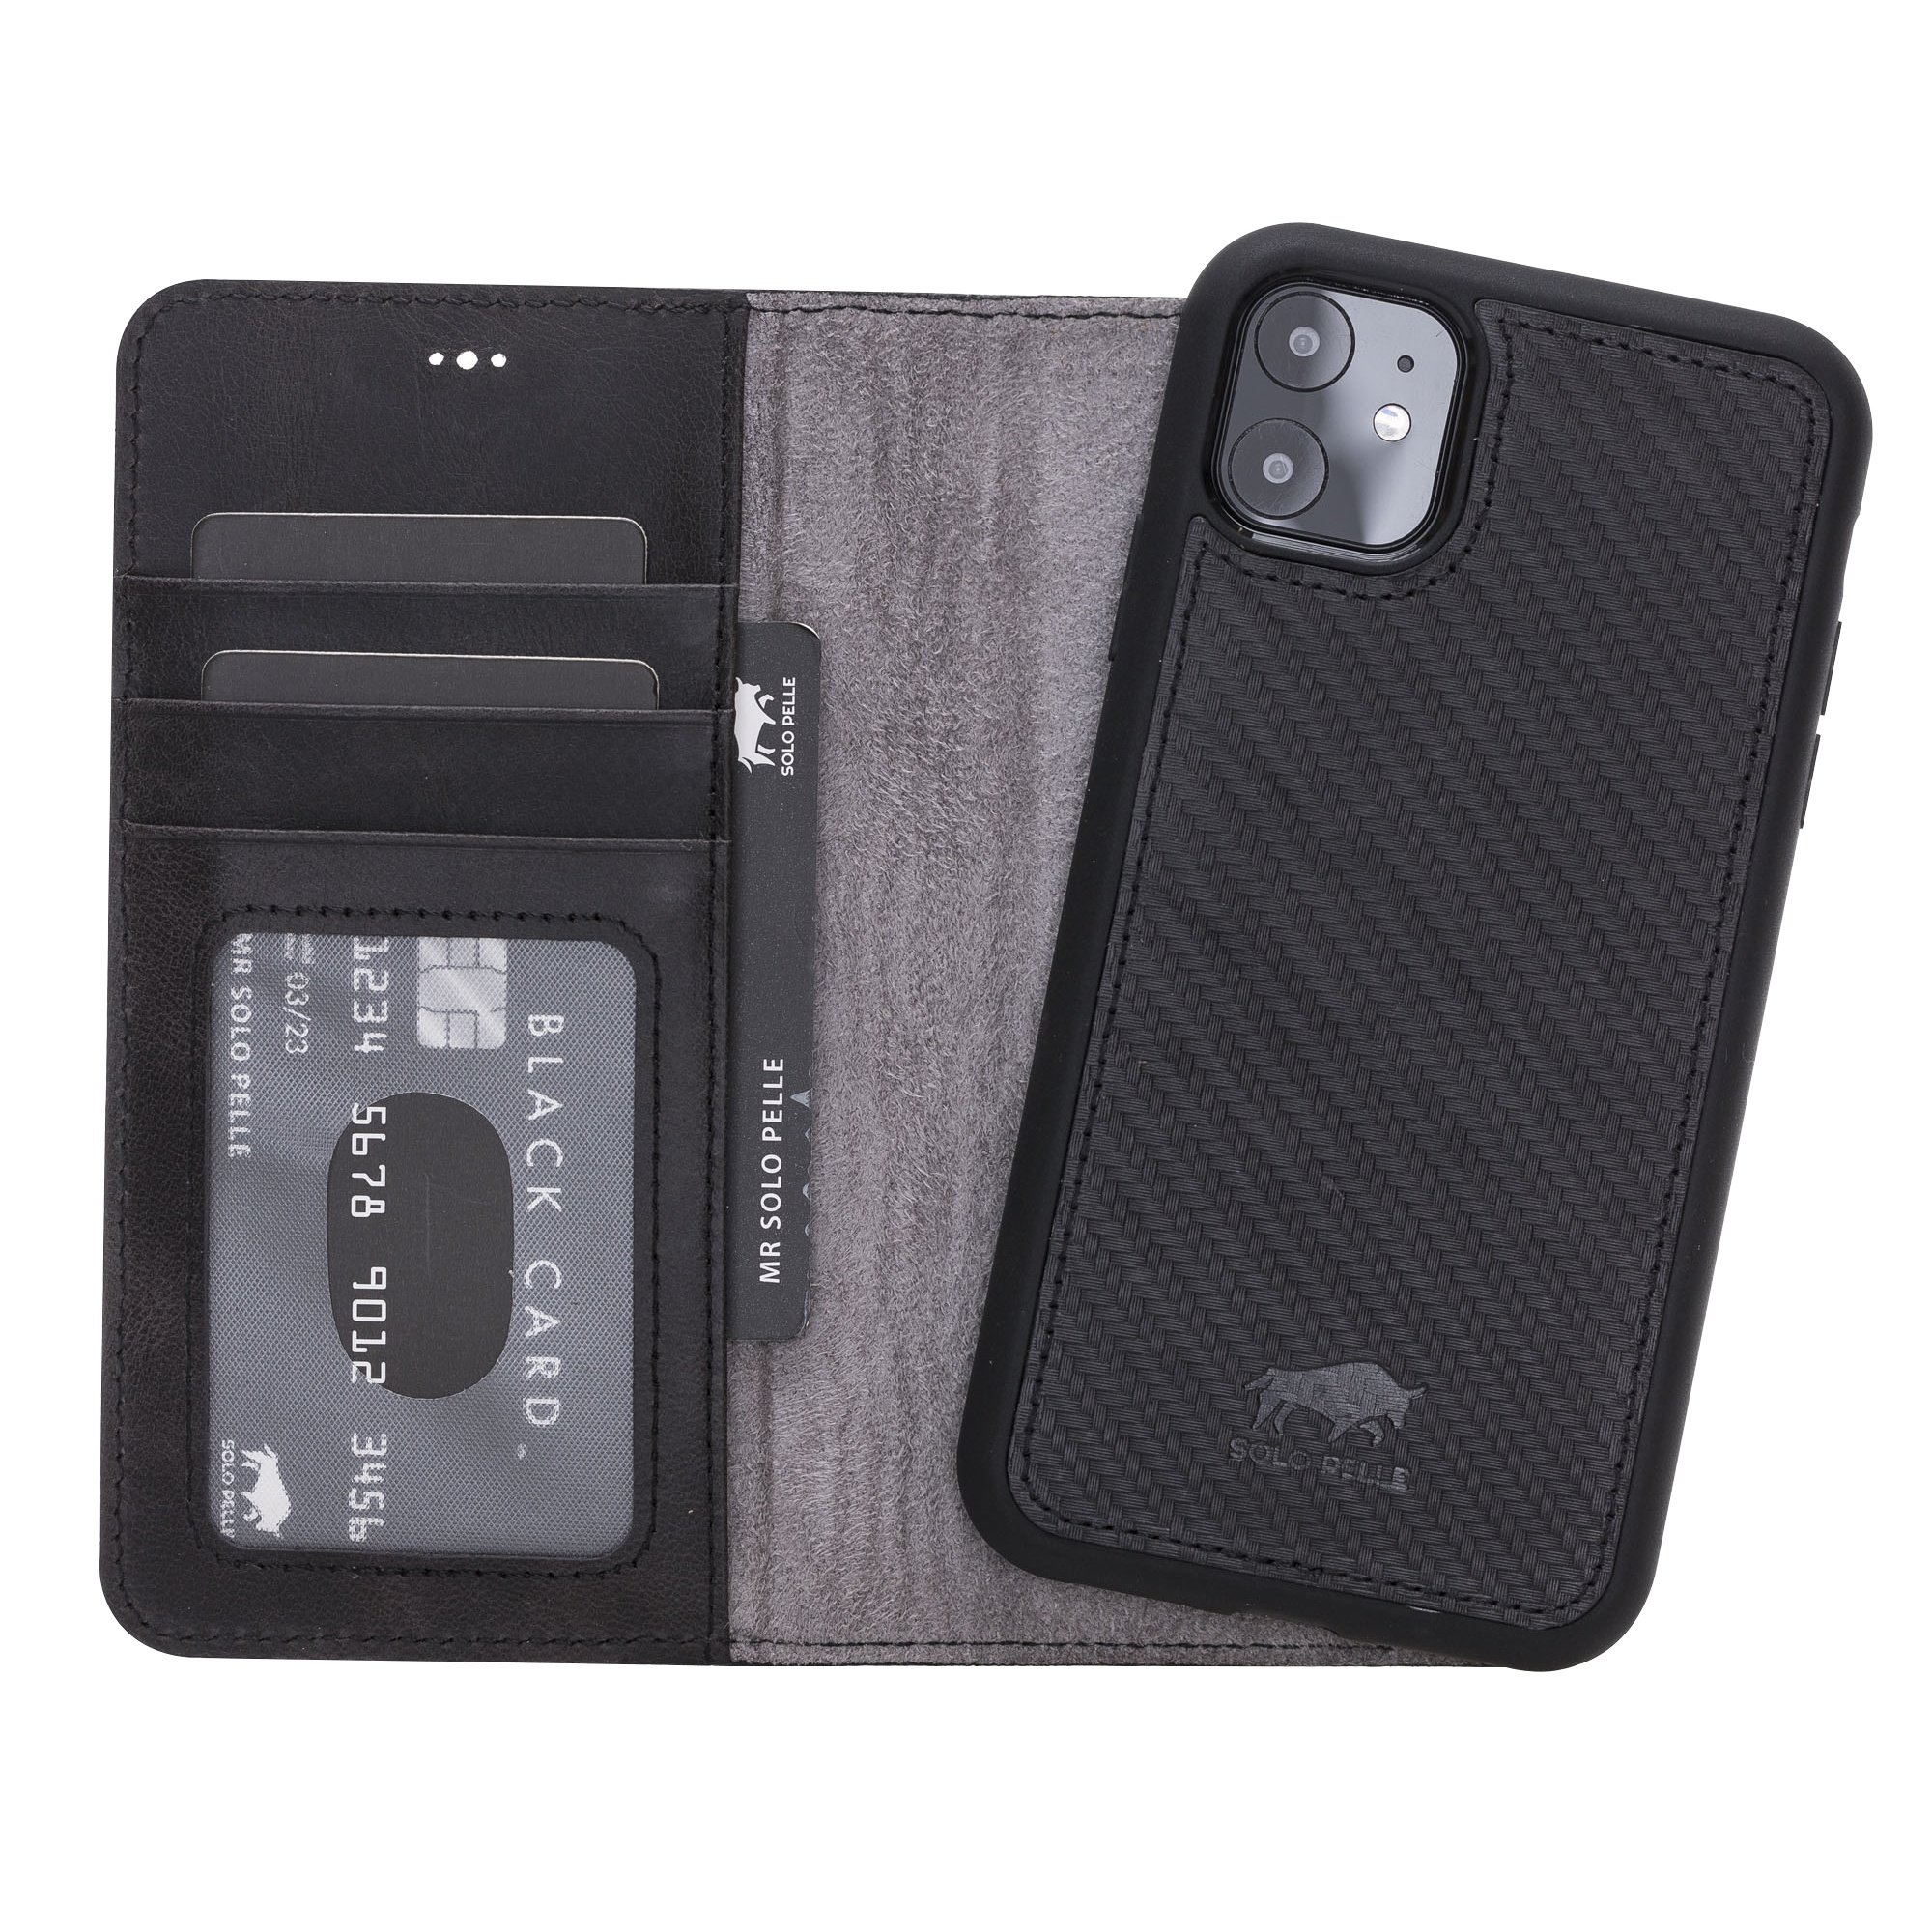 Solo Pelle Lederhülle kompatibel für iPhone 11 in 6.1 Zoll abnehmbare Hülle (2in1) (Carbonprägung Leder)